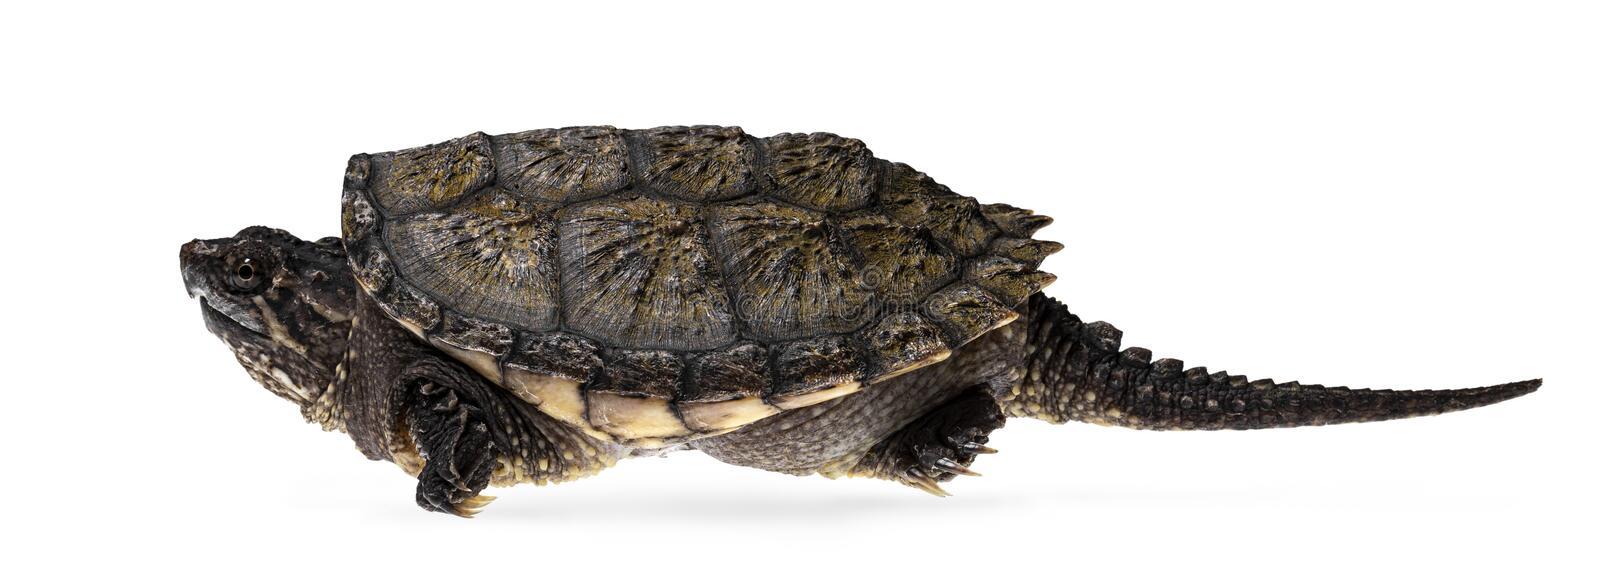 Cách nuôi rùa Common Baby